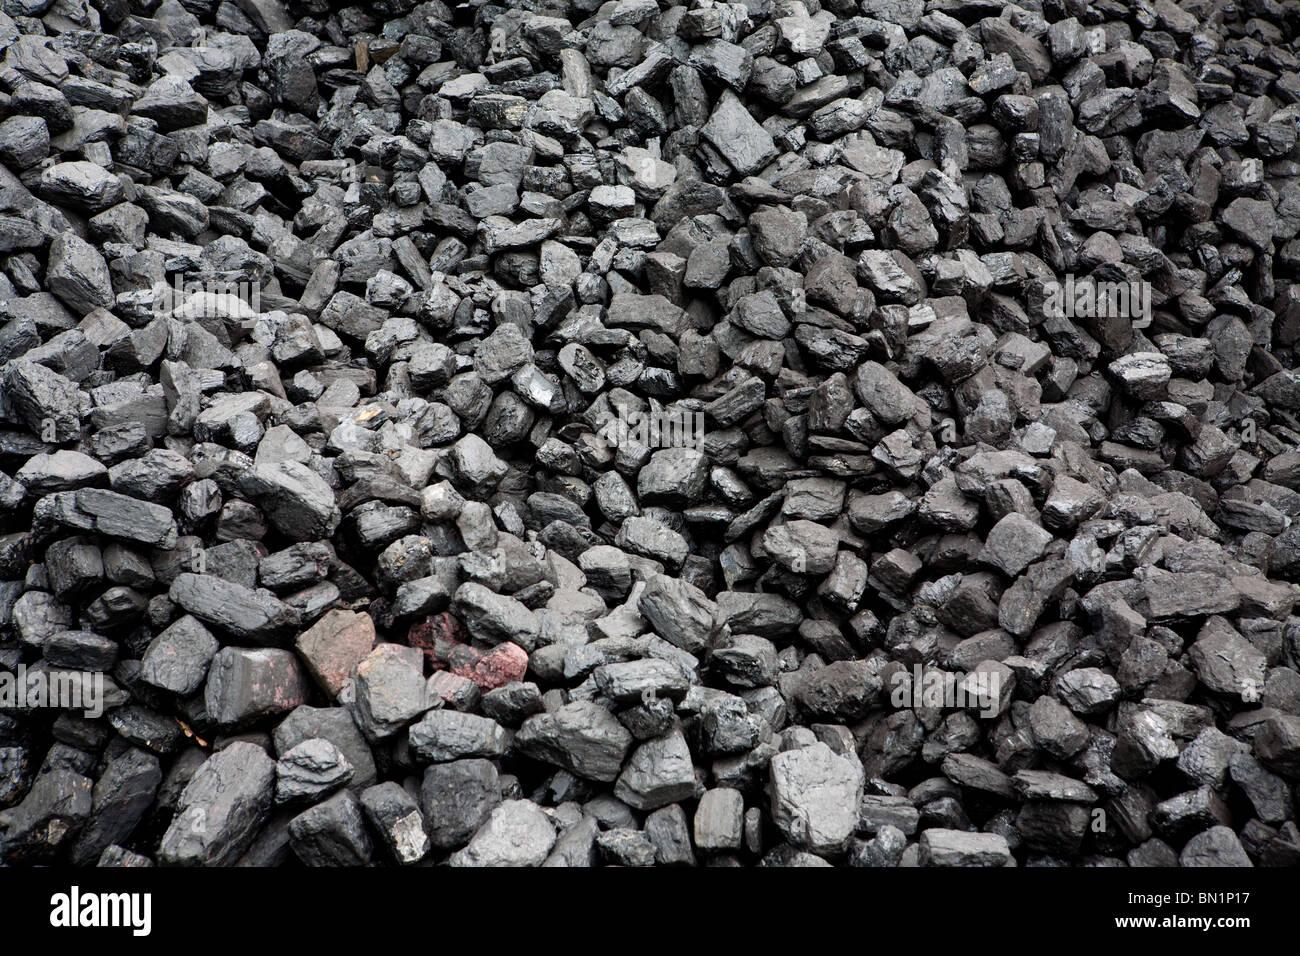 Coal pile at Haverthwaite Station on the Lakeside and Haverthwaite Railway in Cumbria Stock Photo